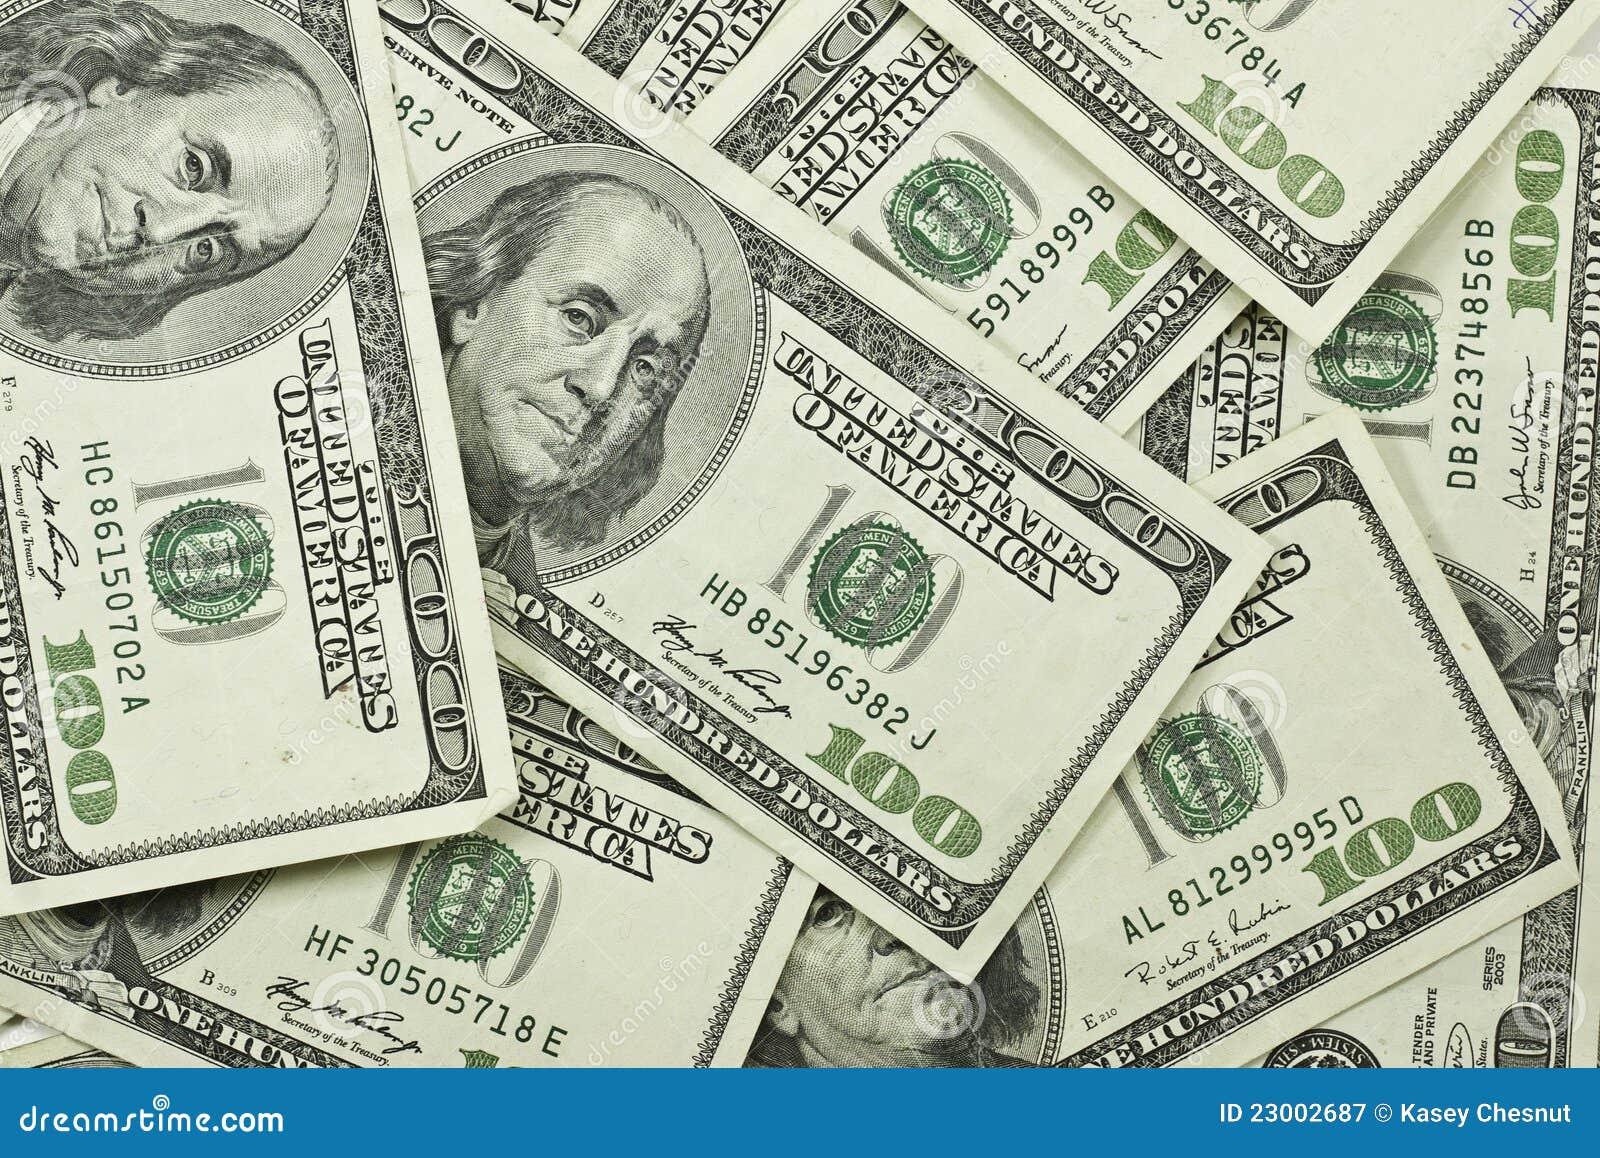 Pile Of 100 Dollar Bills Stock Image Image Of Finance